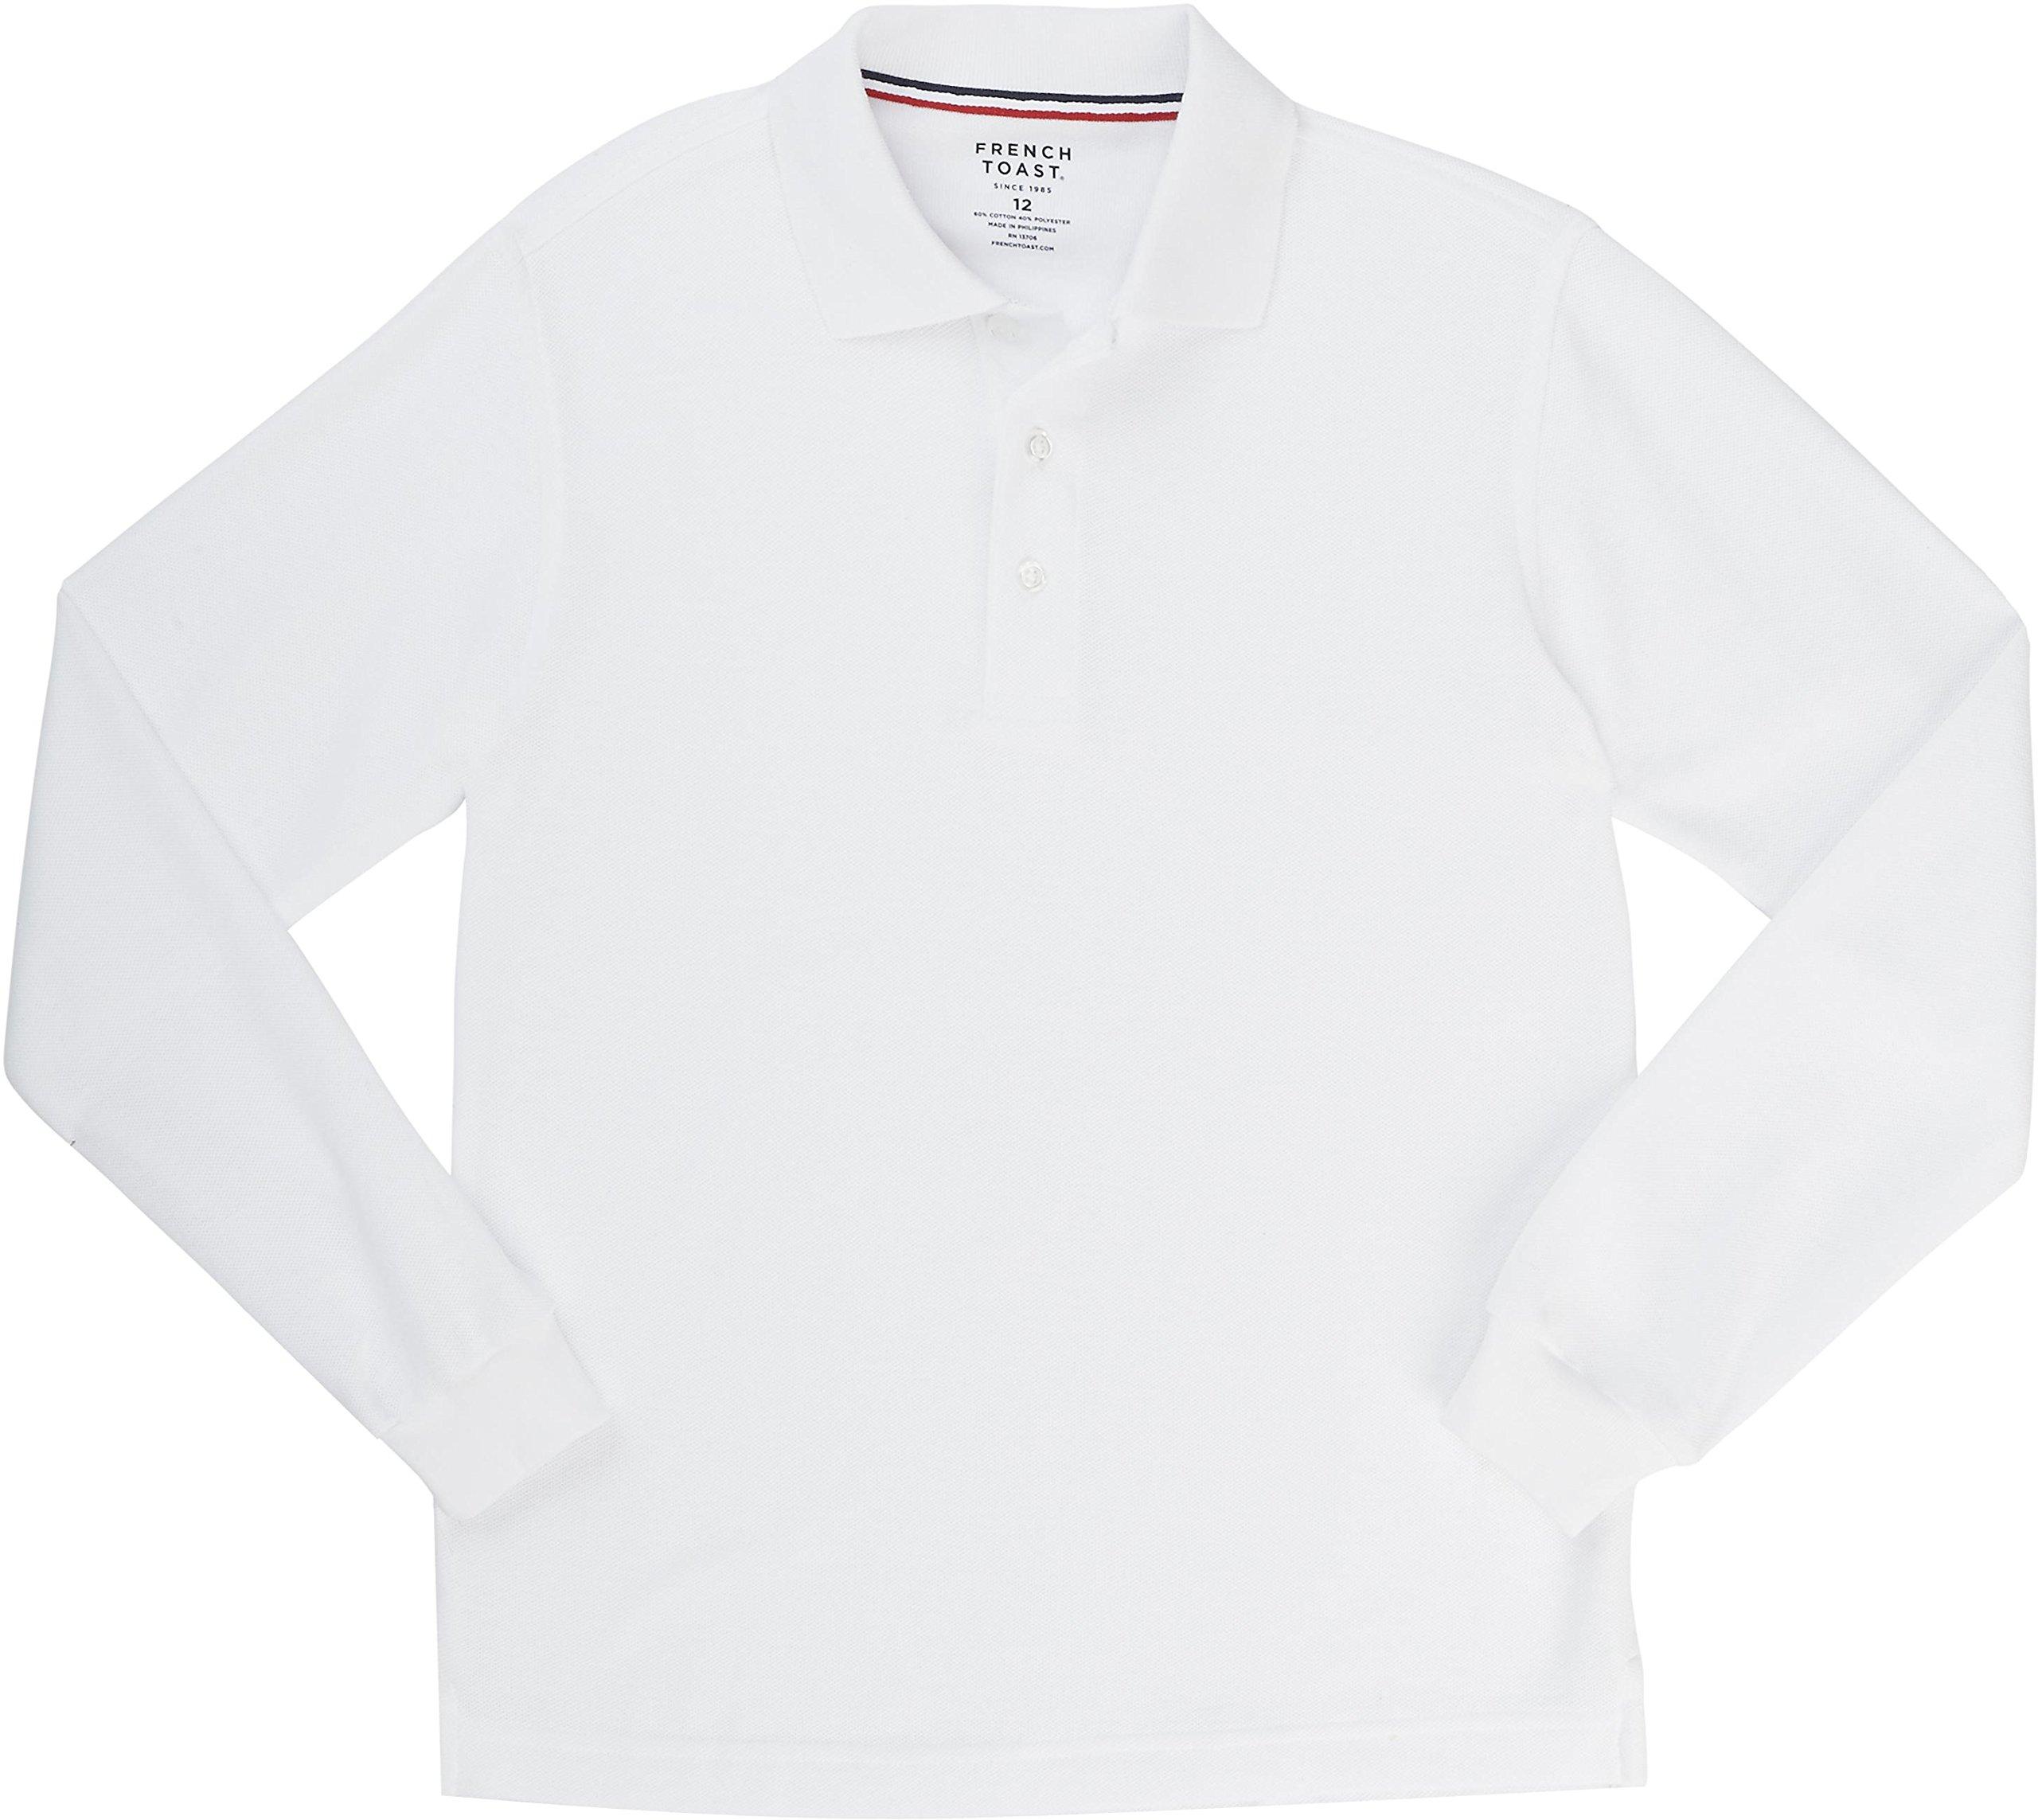 French Toast School Uniform Boys Long Sleeve Pique Polo Shirt, White, Small (6/7)